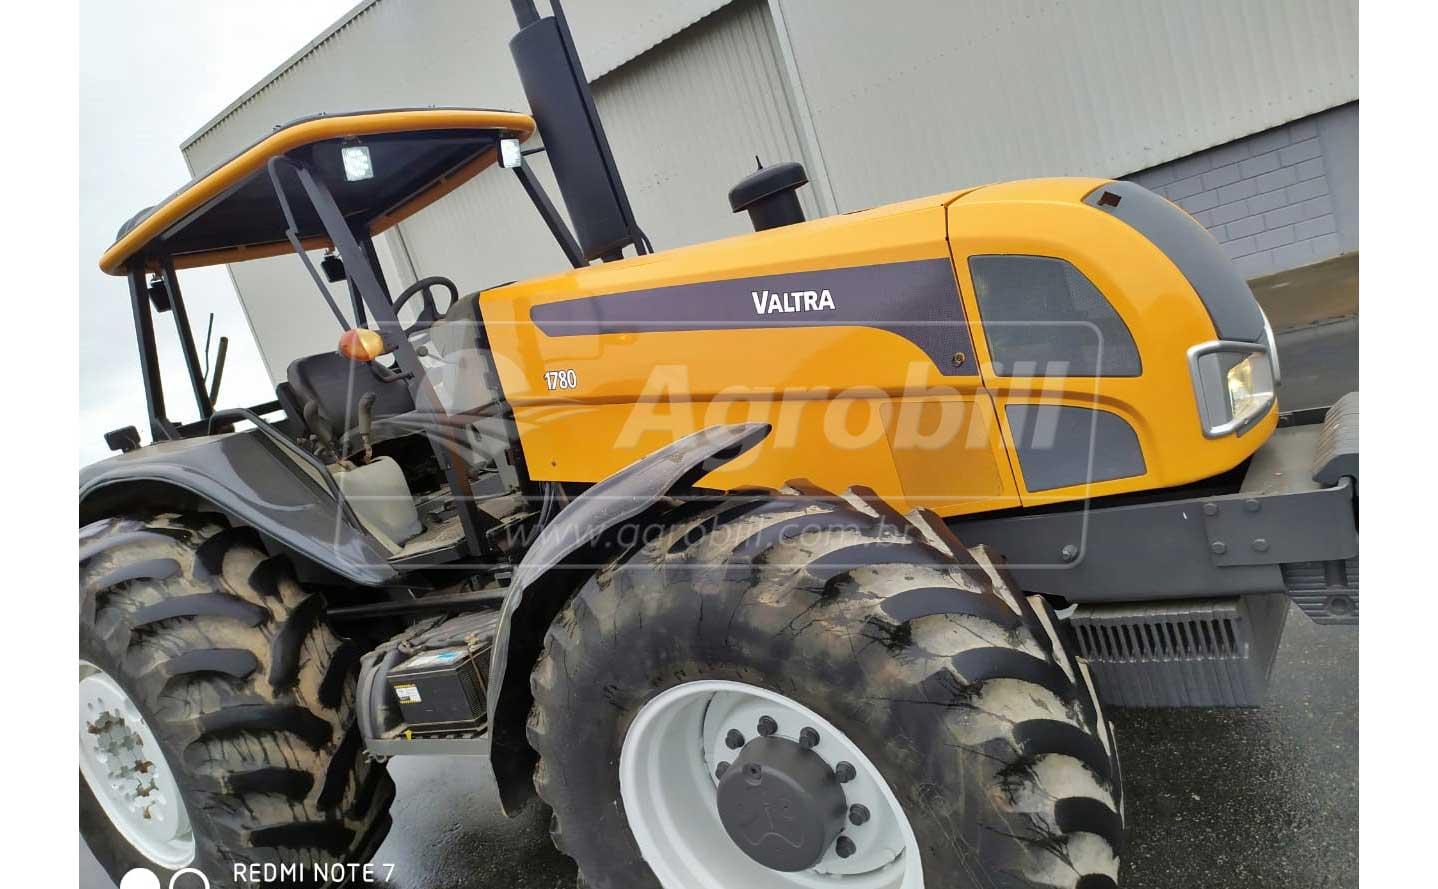 Trator Valtra 1780 4×4 ano 2008, único dono. - Tratores - Valtra - Agrobill - Tratores, Implementos Agrícolas, Pneus